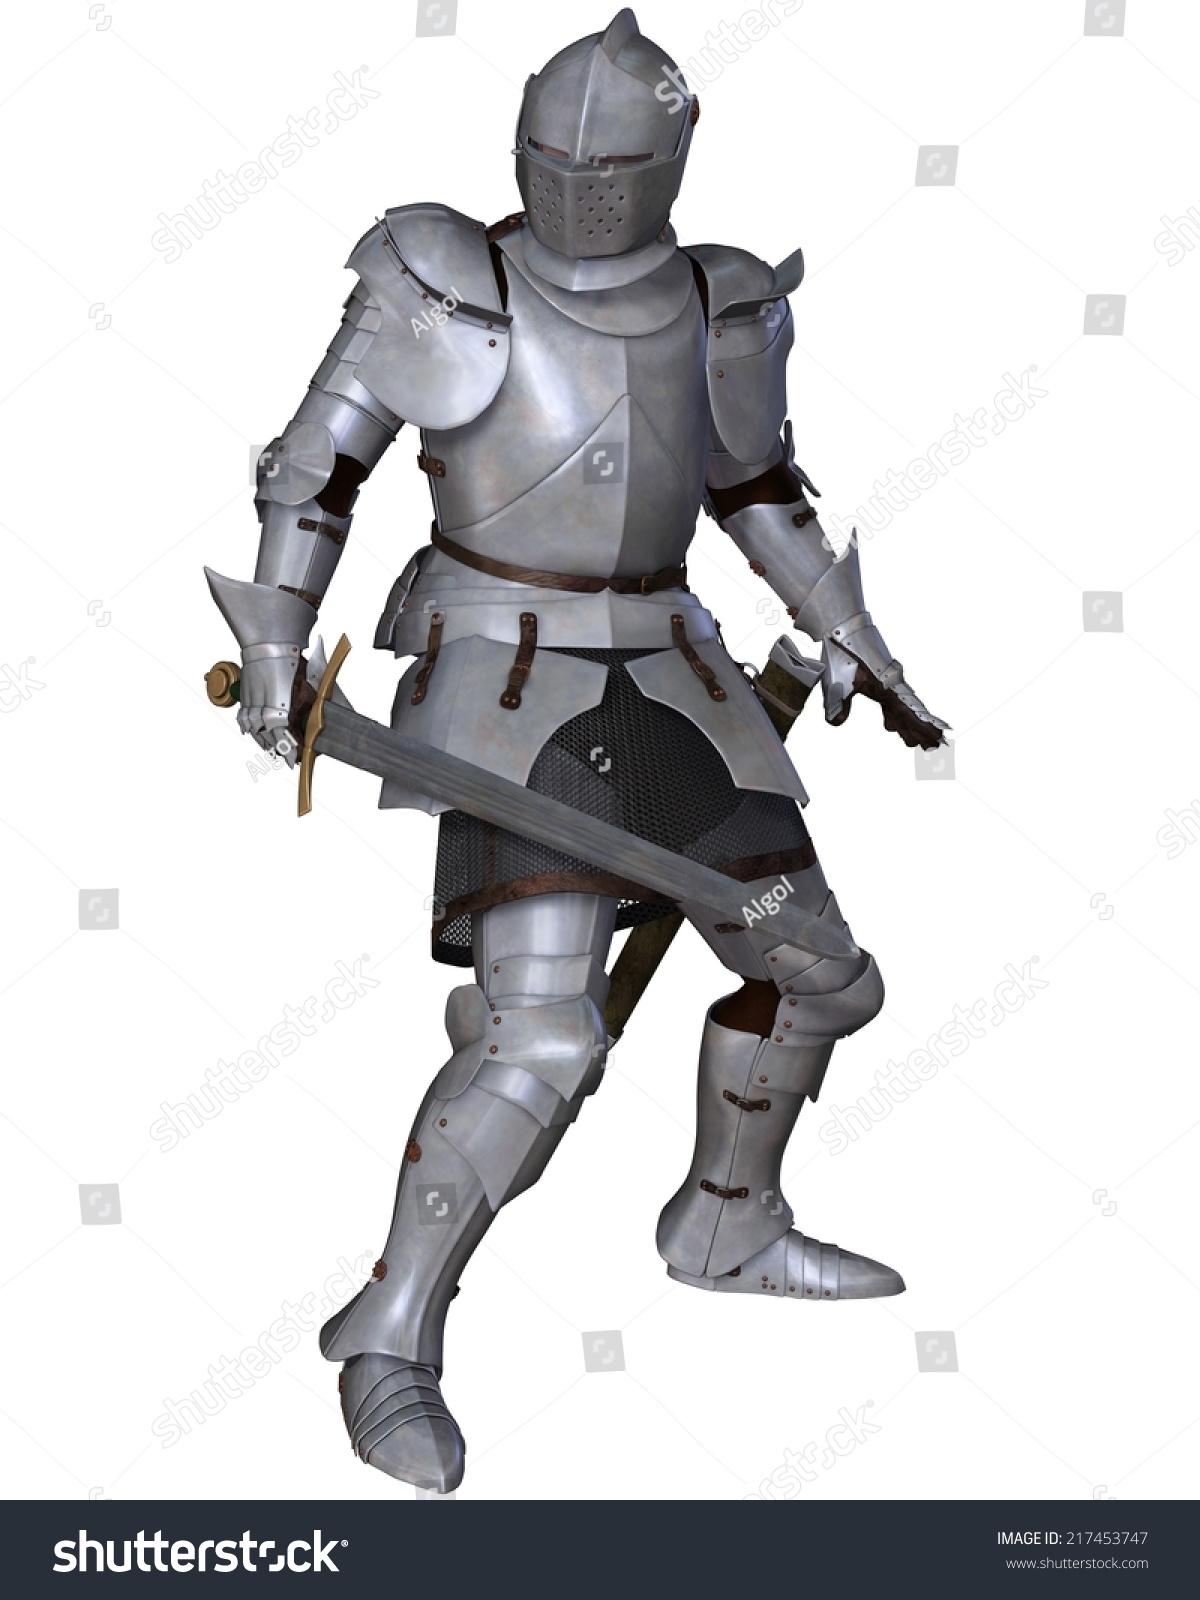 Lady knight in shining armor